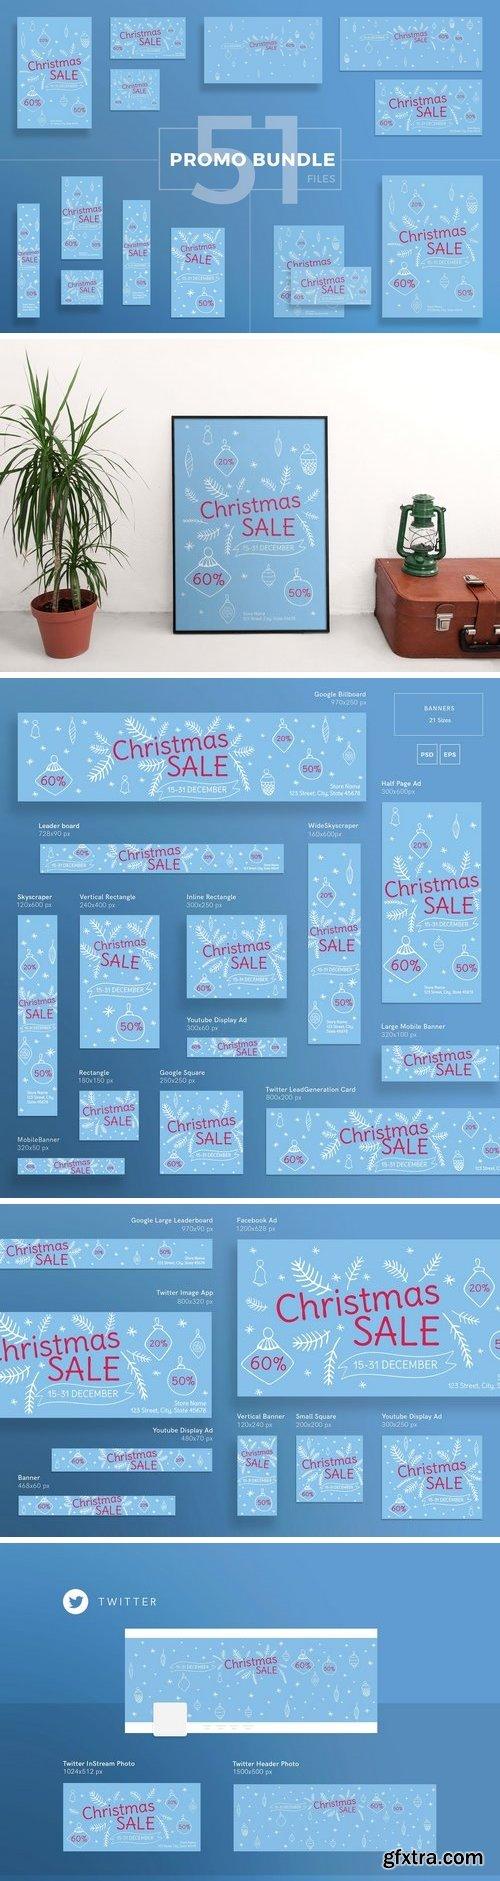 CM - Promo Bundle   Christmas Sale 2085535